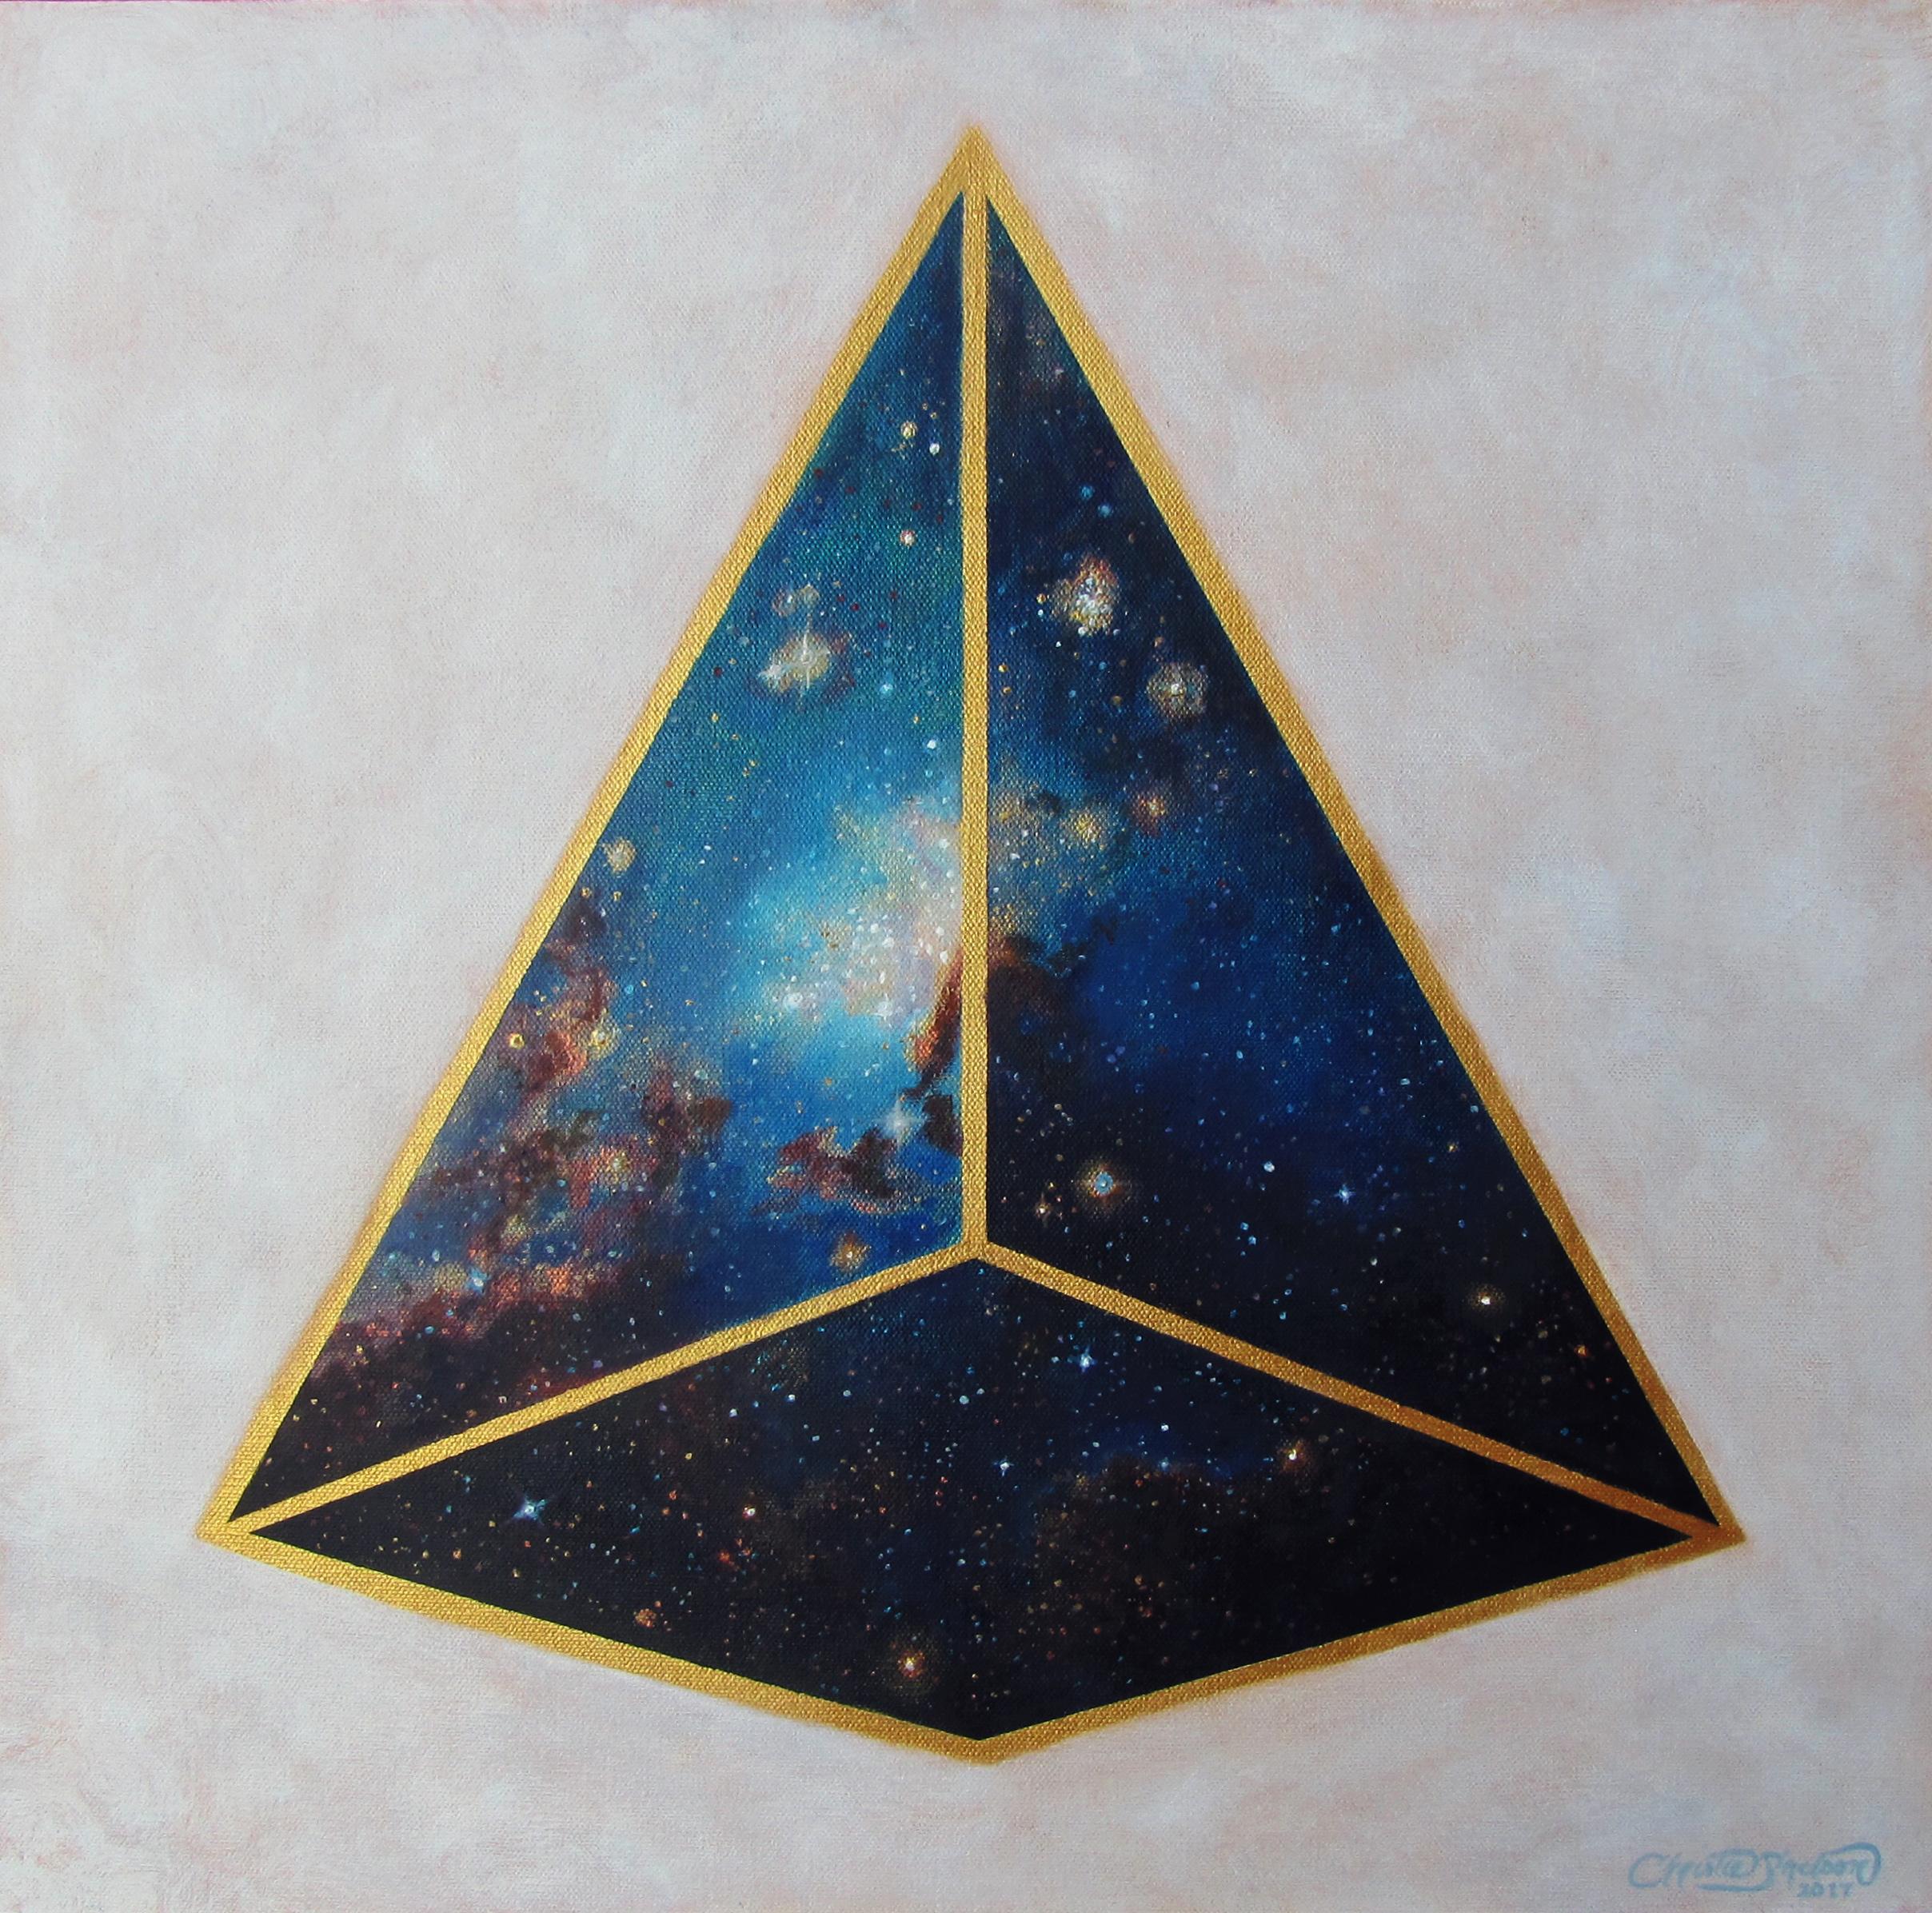 """22: Star Forming Region in the LMC"""